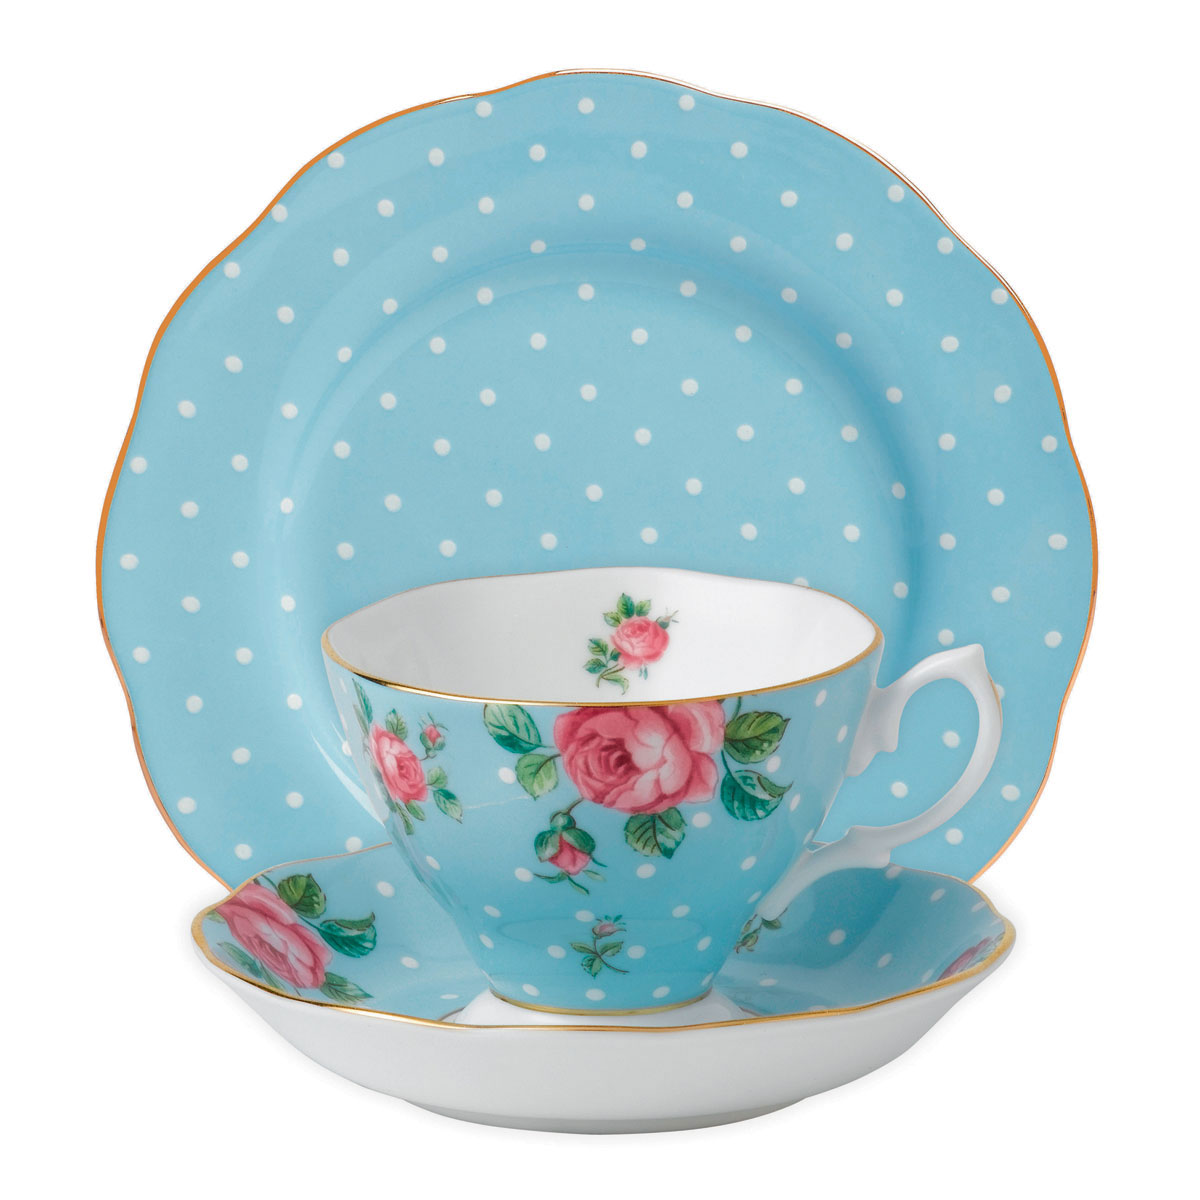 "Royal Albert Polka Blue Teacup, Saucer and 8"" Plate Set"